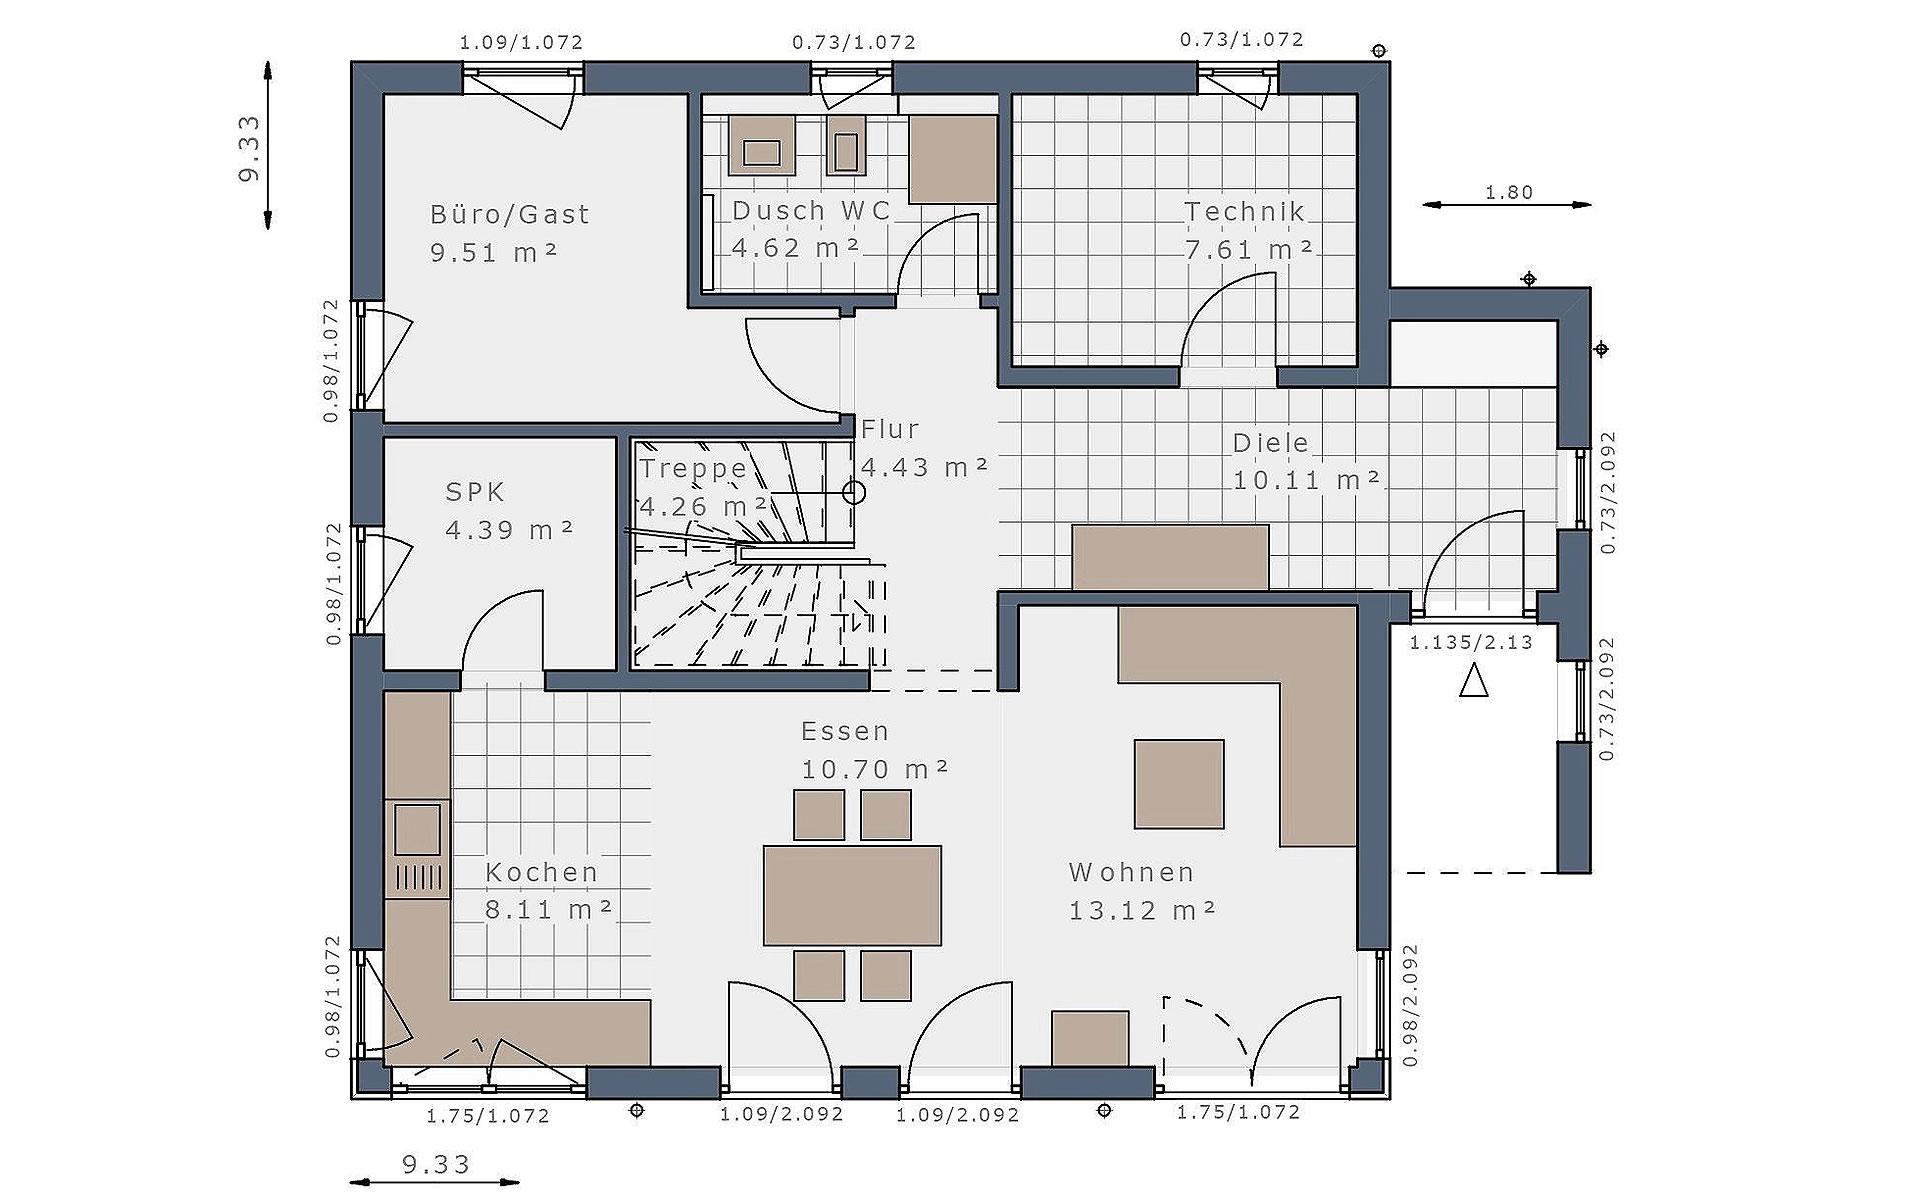 Erdgeschoss Solitaire-E-145 E2 von Schwabenhaus GmbH & Co. KG